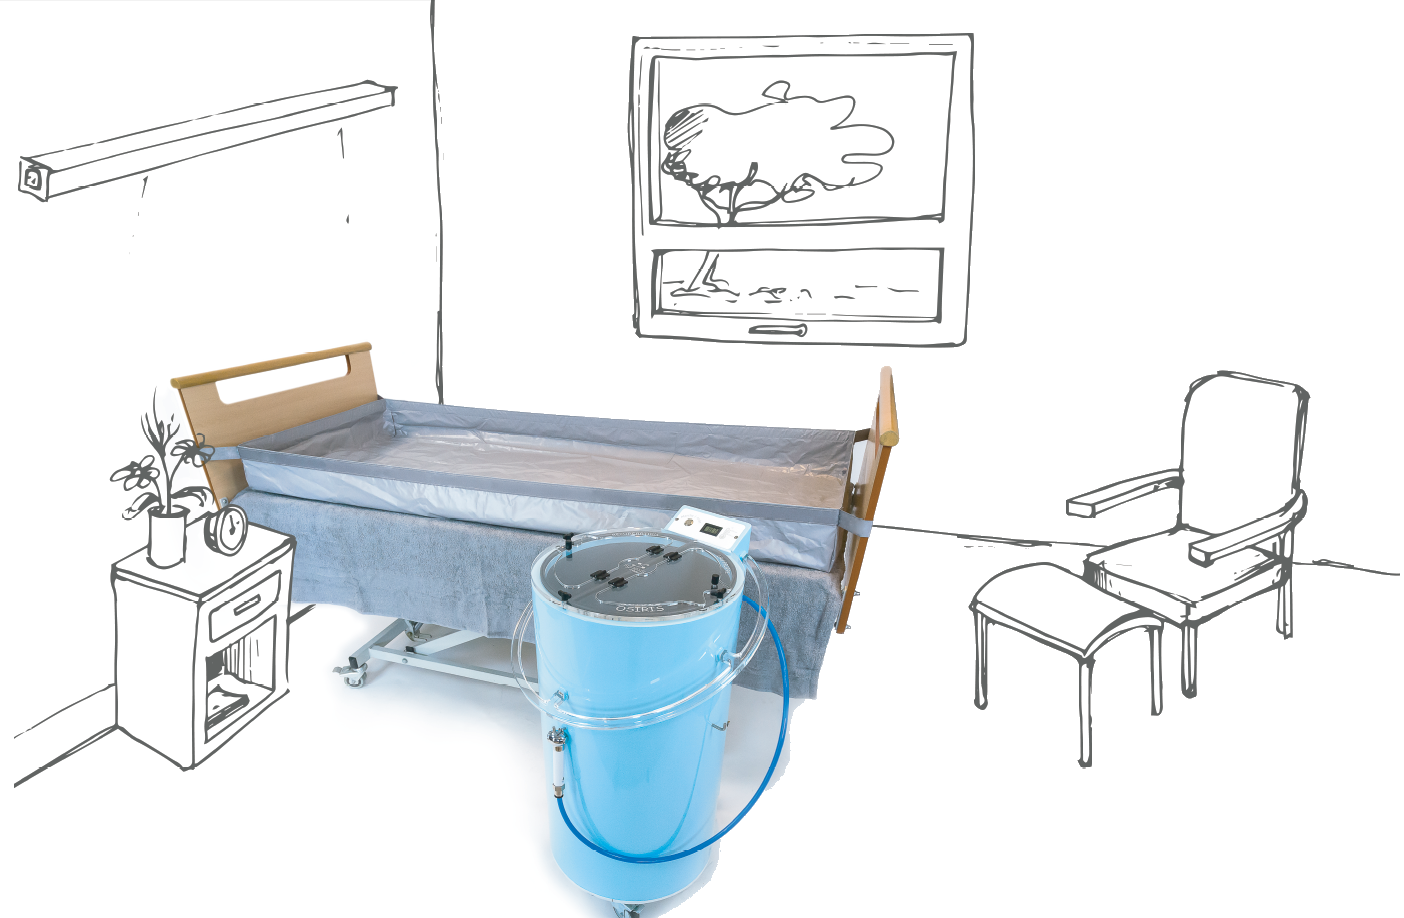 Osiris, Synoxis Médical, Dispositif médical, douche aux lits